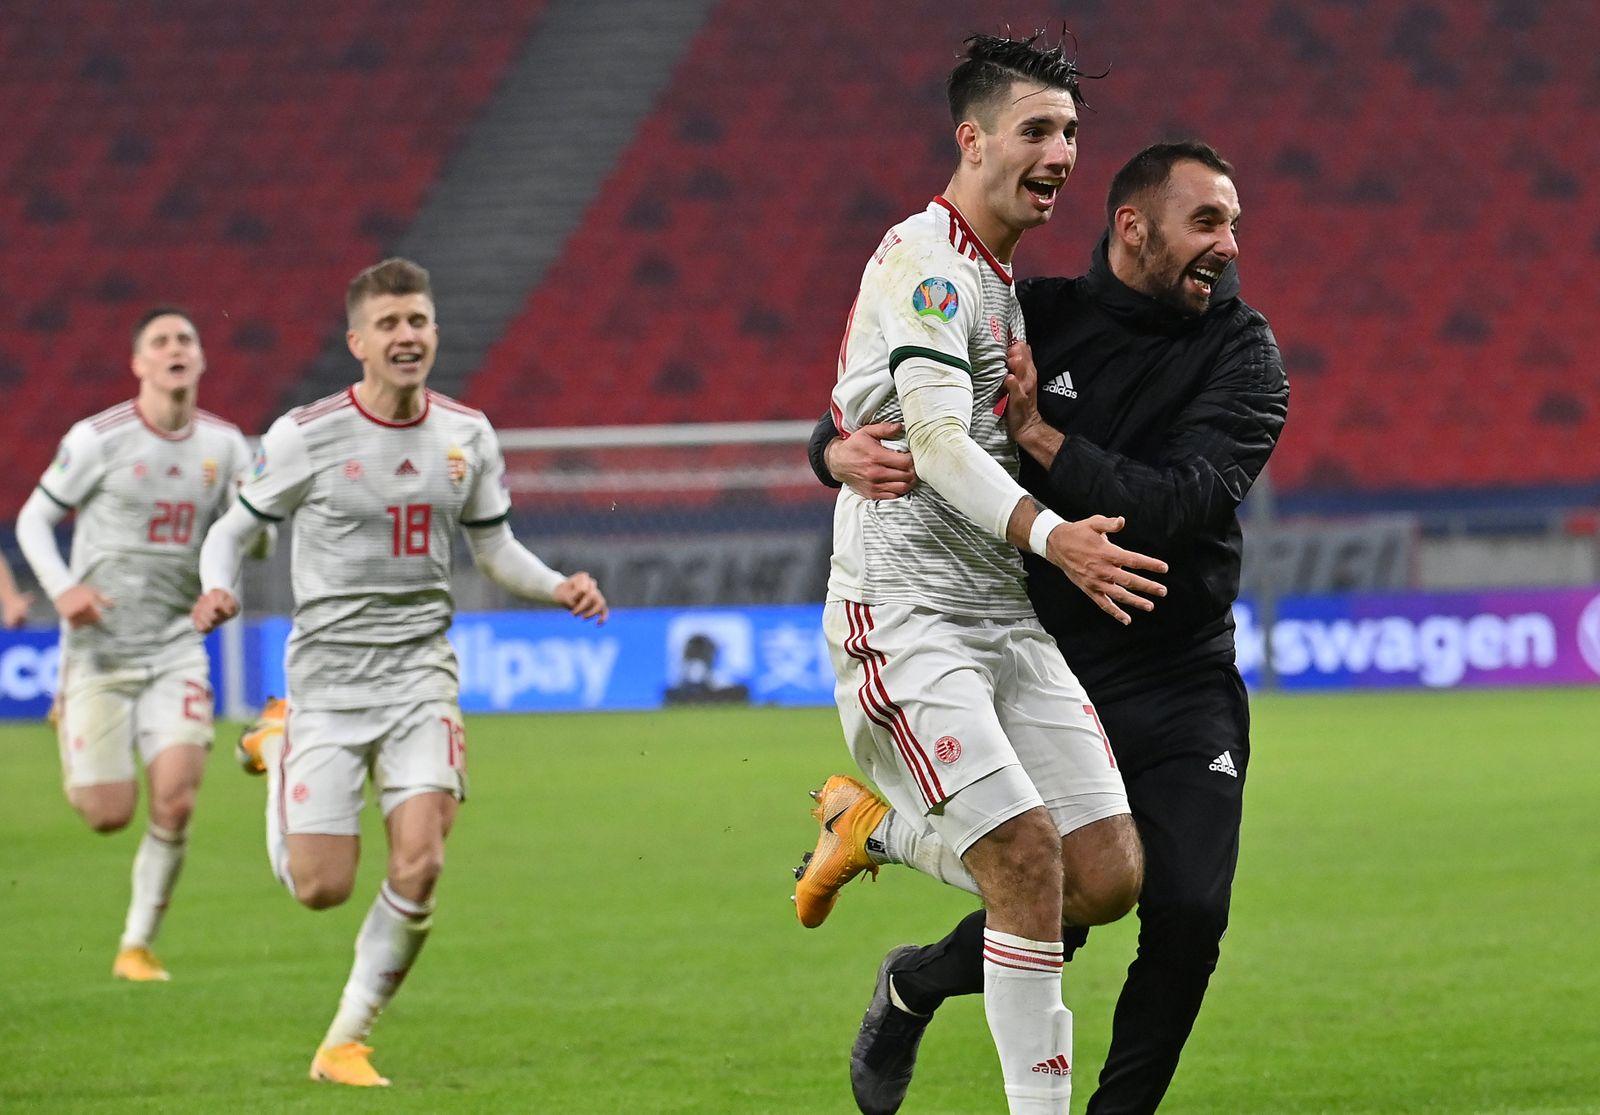 Hungary vs. Iceland, Budapest - 12 Nov 2020